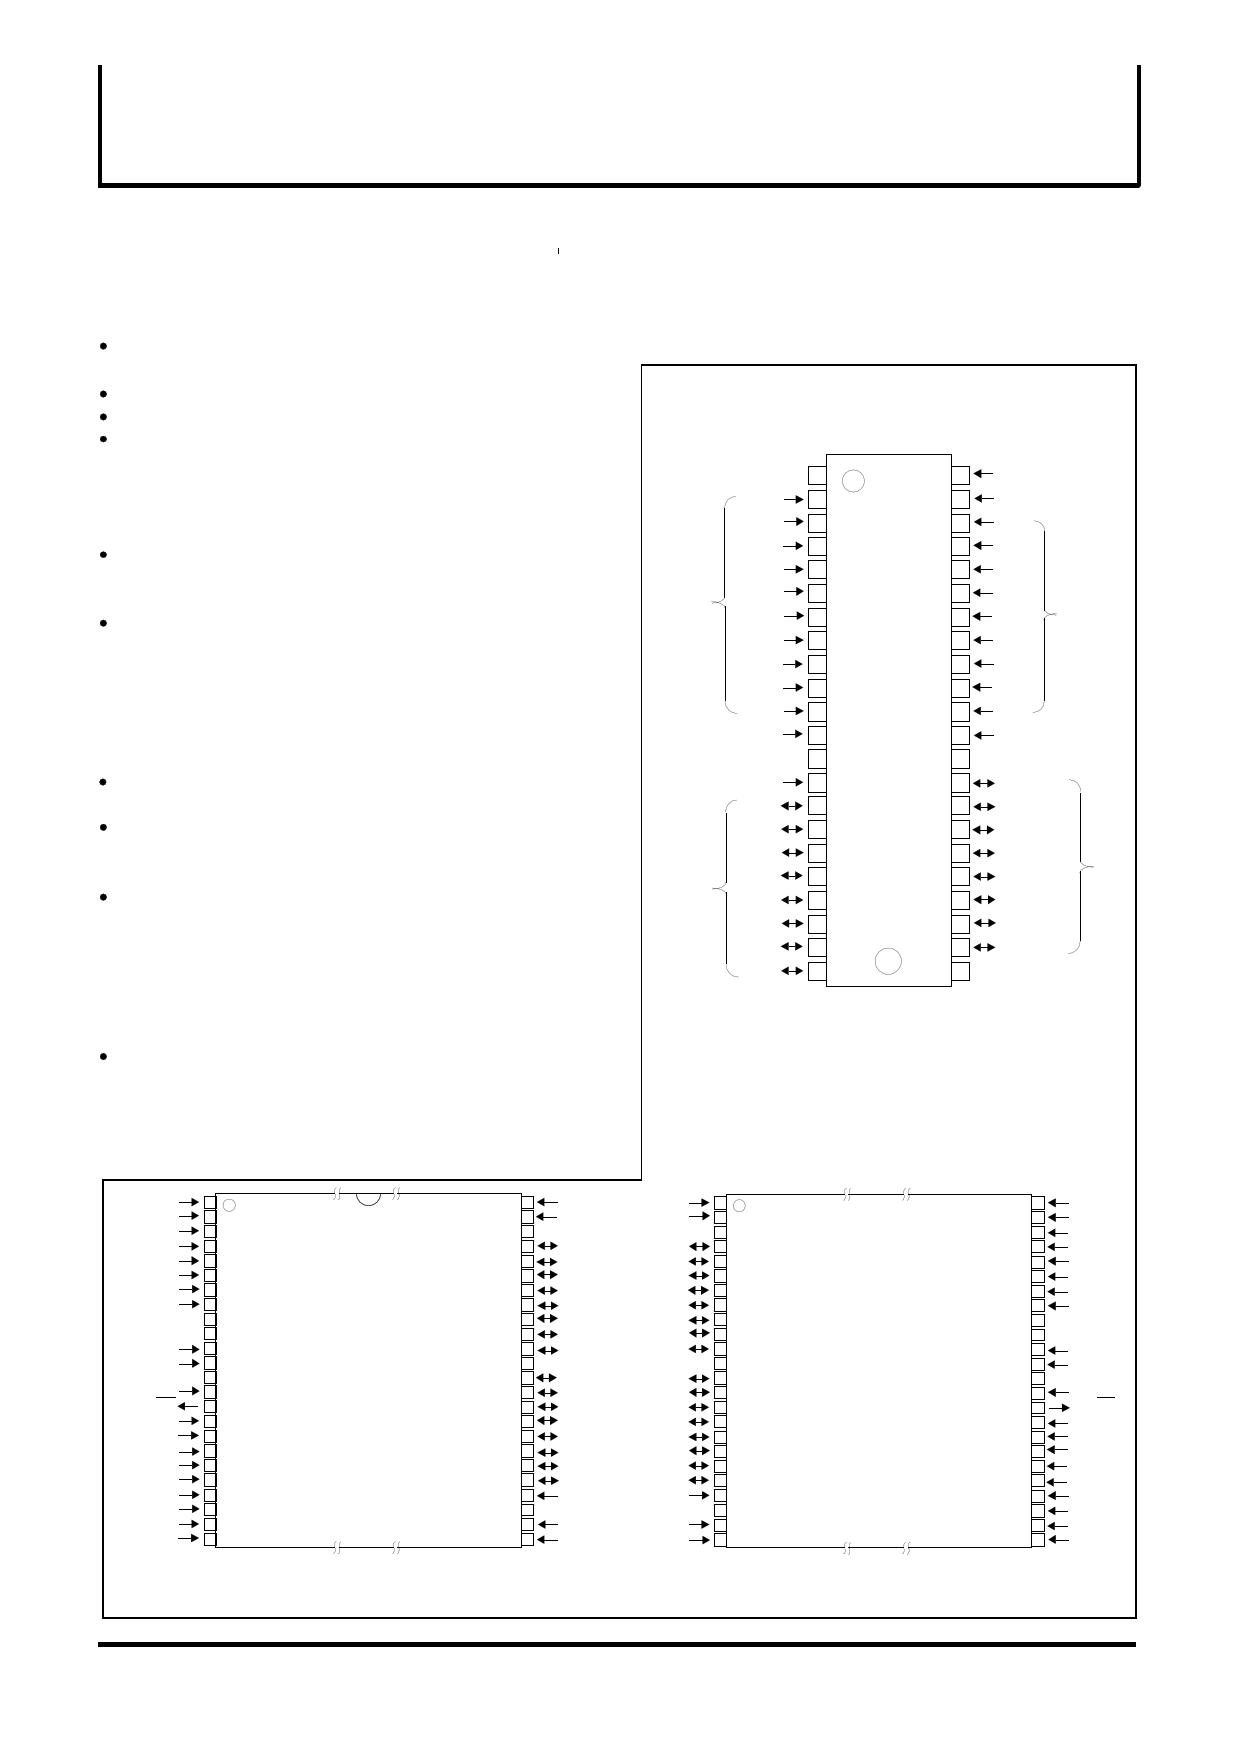 M5M29FB800RV-12 Datasheet, ピン配置, 機能